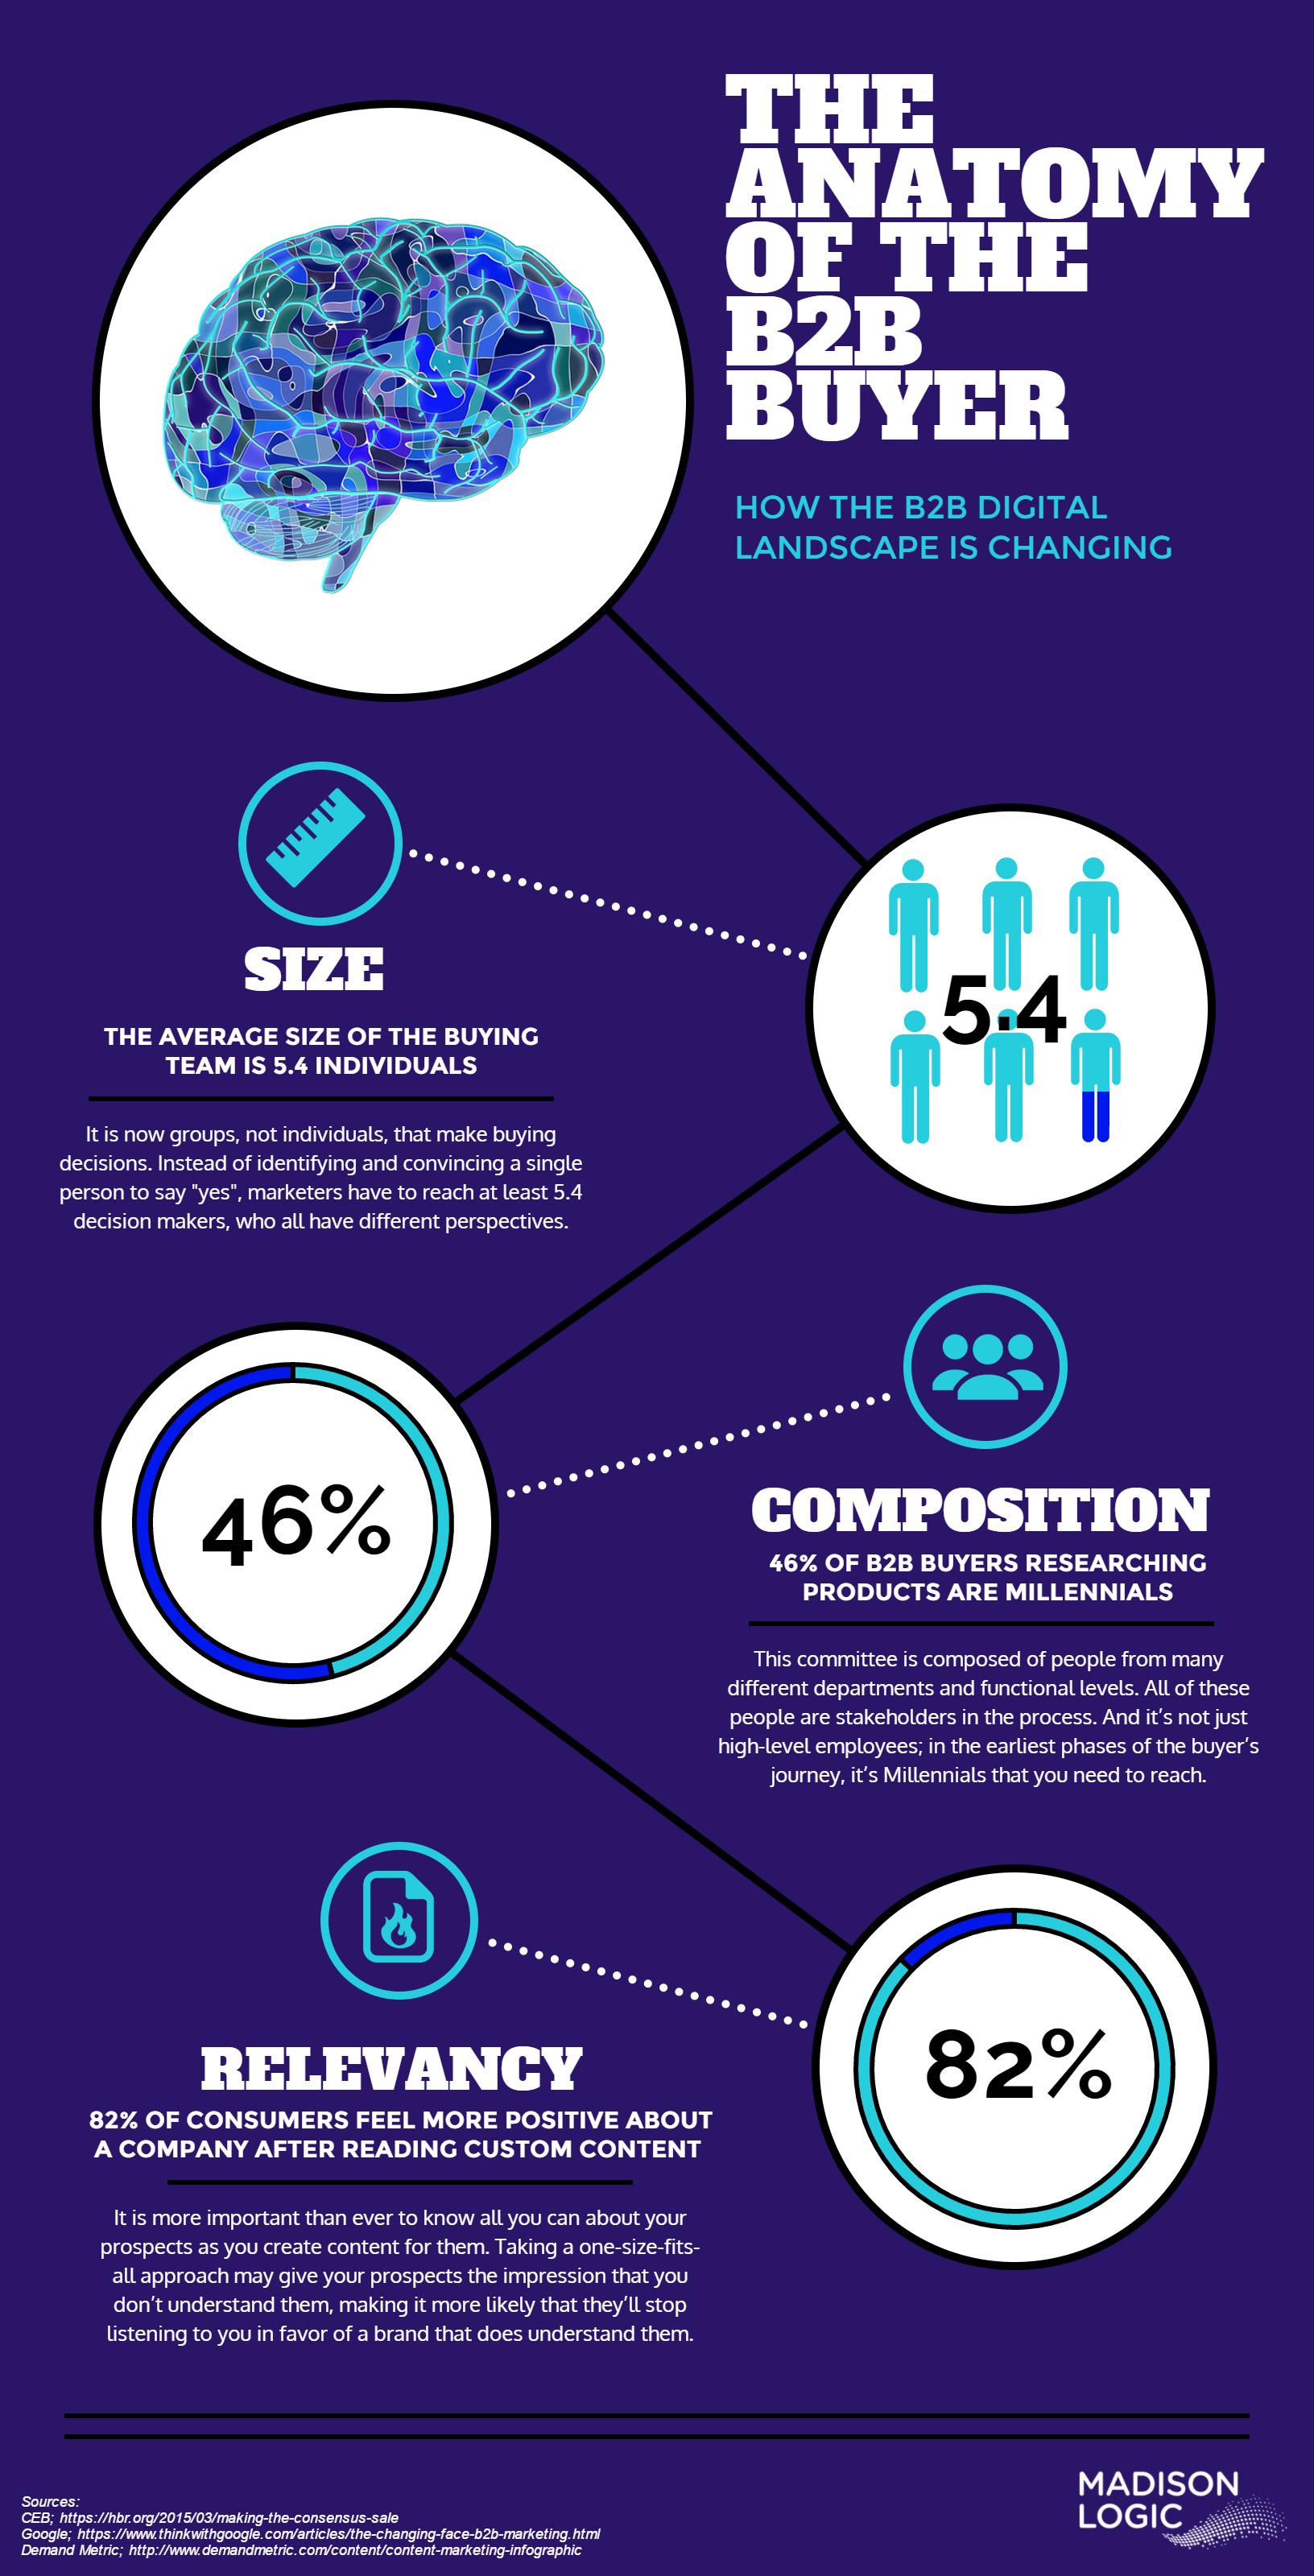 The Anatomy of the B2B Buyer Infographic